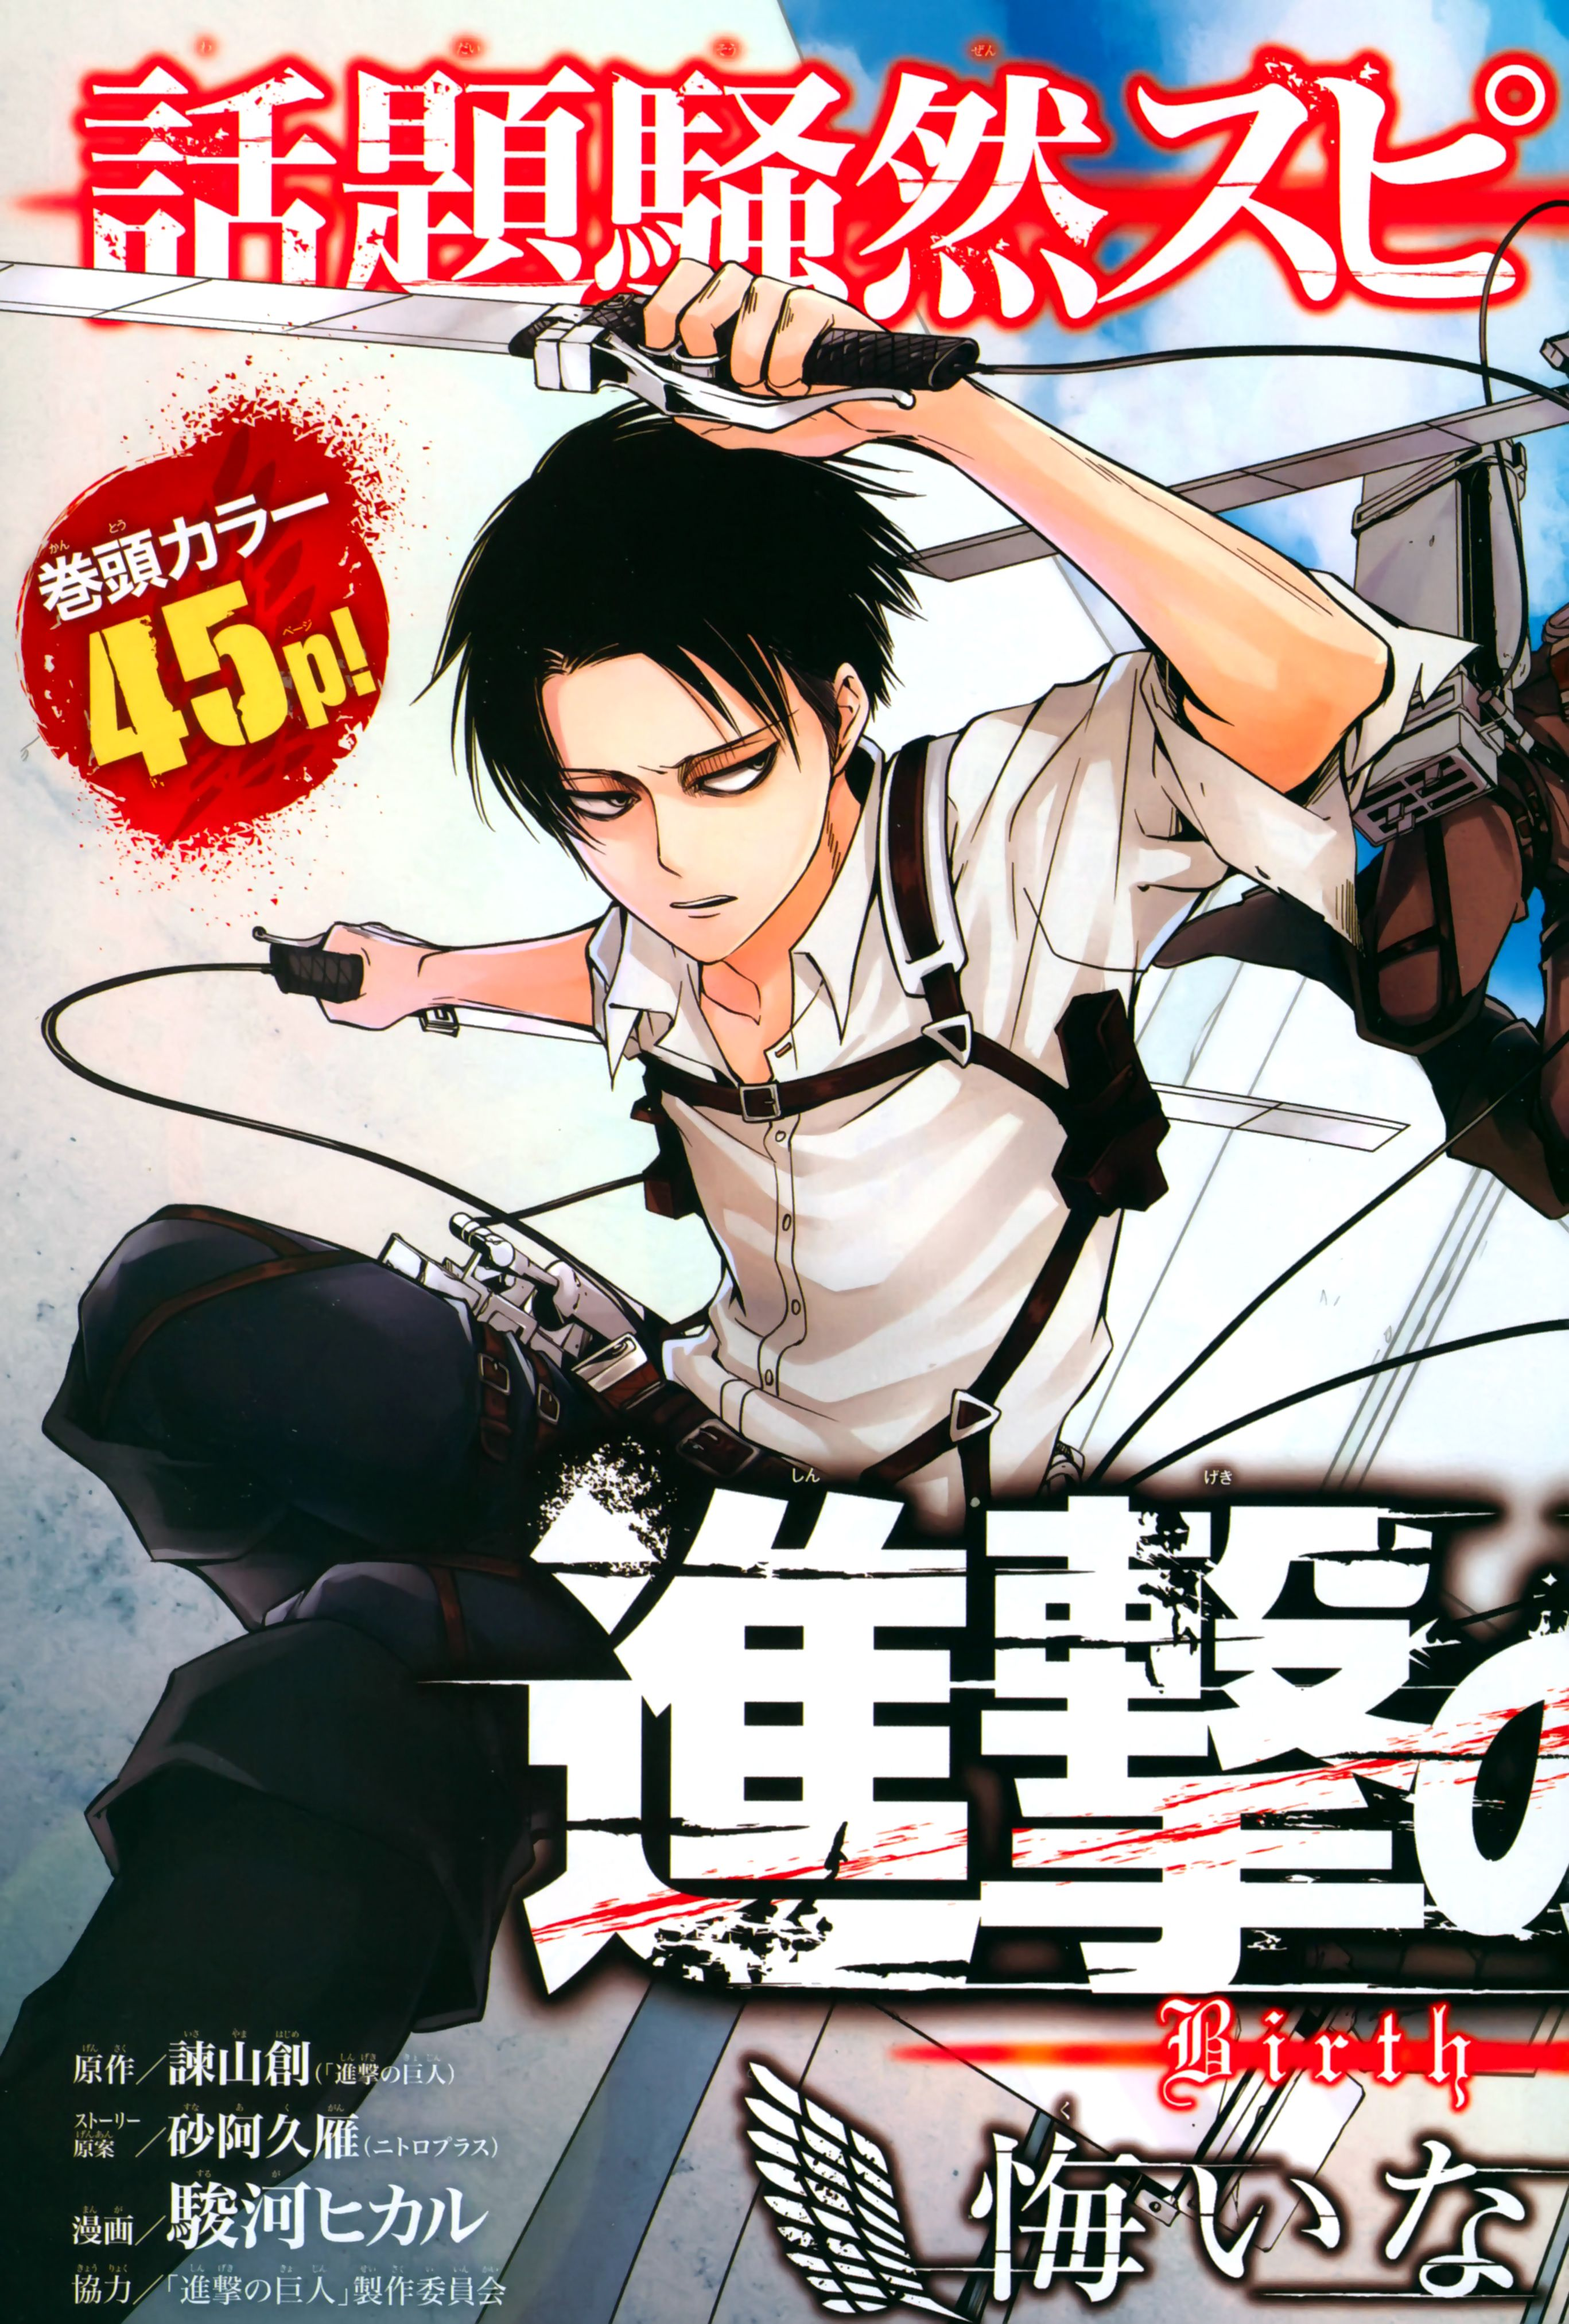 Levi by Suruga Hikaru Anime, Attack on titan, Shingeki